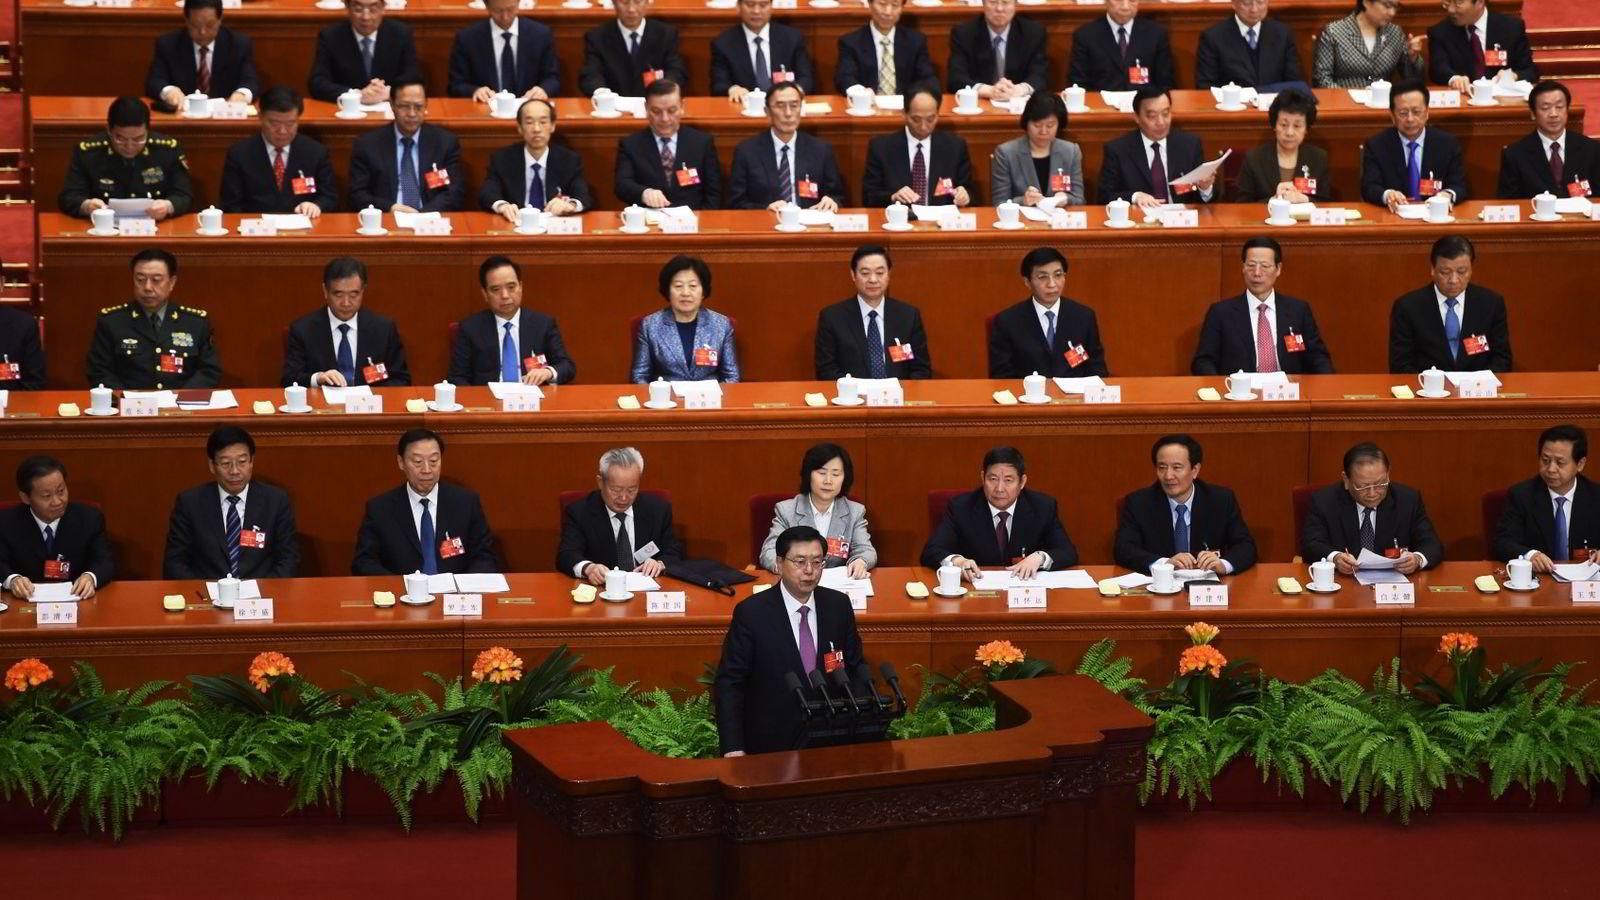 Formann  Zhang Dejiang i Den stående komiteen taler onsdag under Folkekongressen som holdes i den store Folkets hall i Beijing. Foto: Greg Baker/AFP/NTB scanpix.